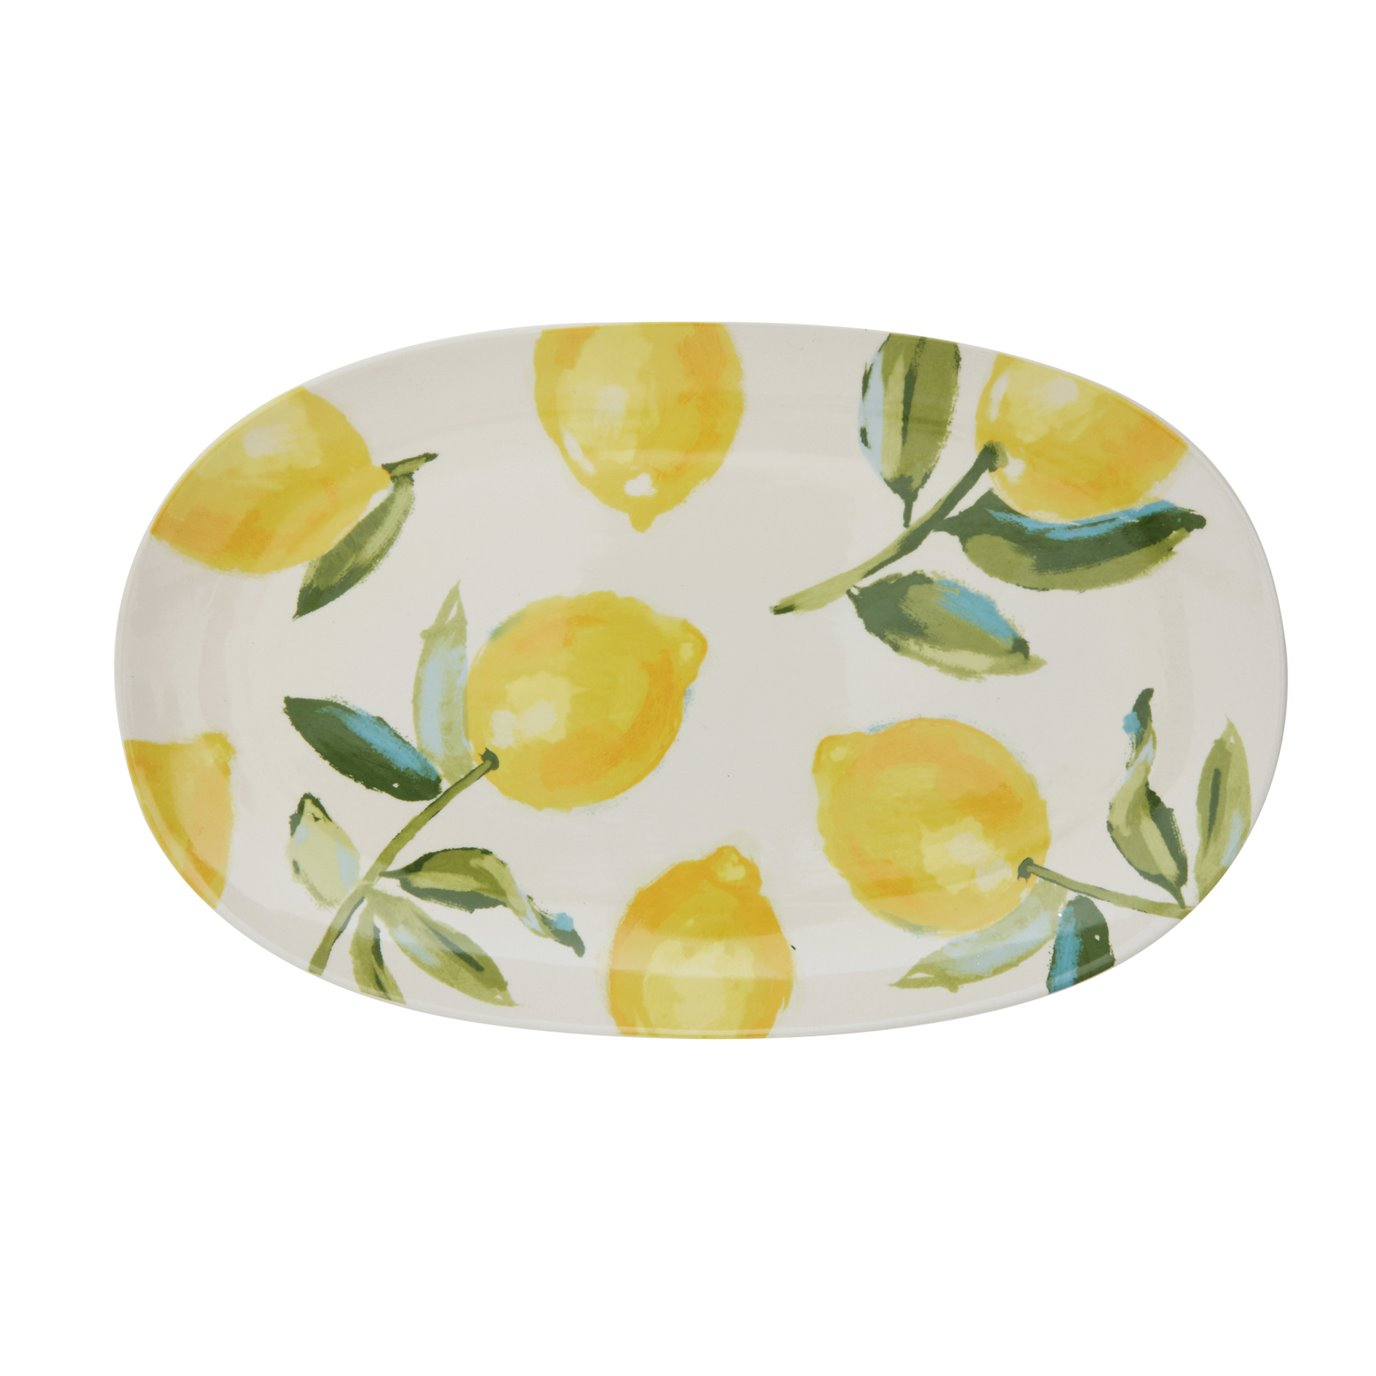 Platter with Lemon Images